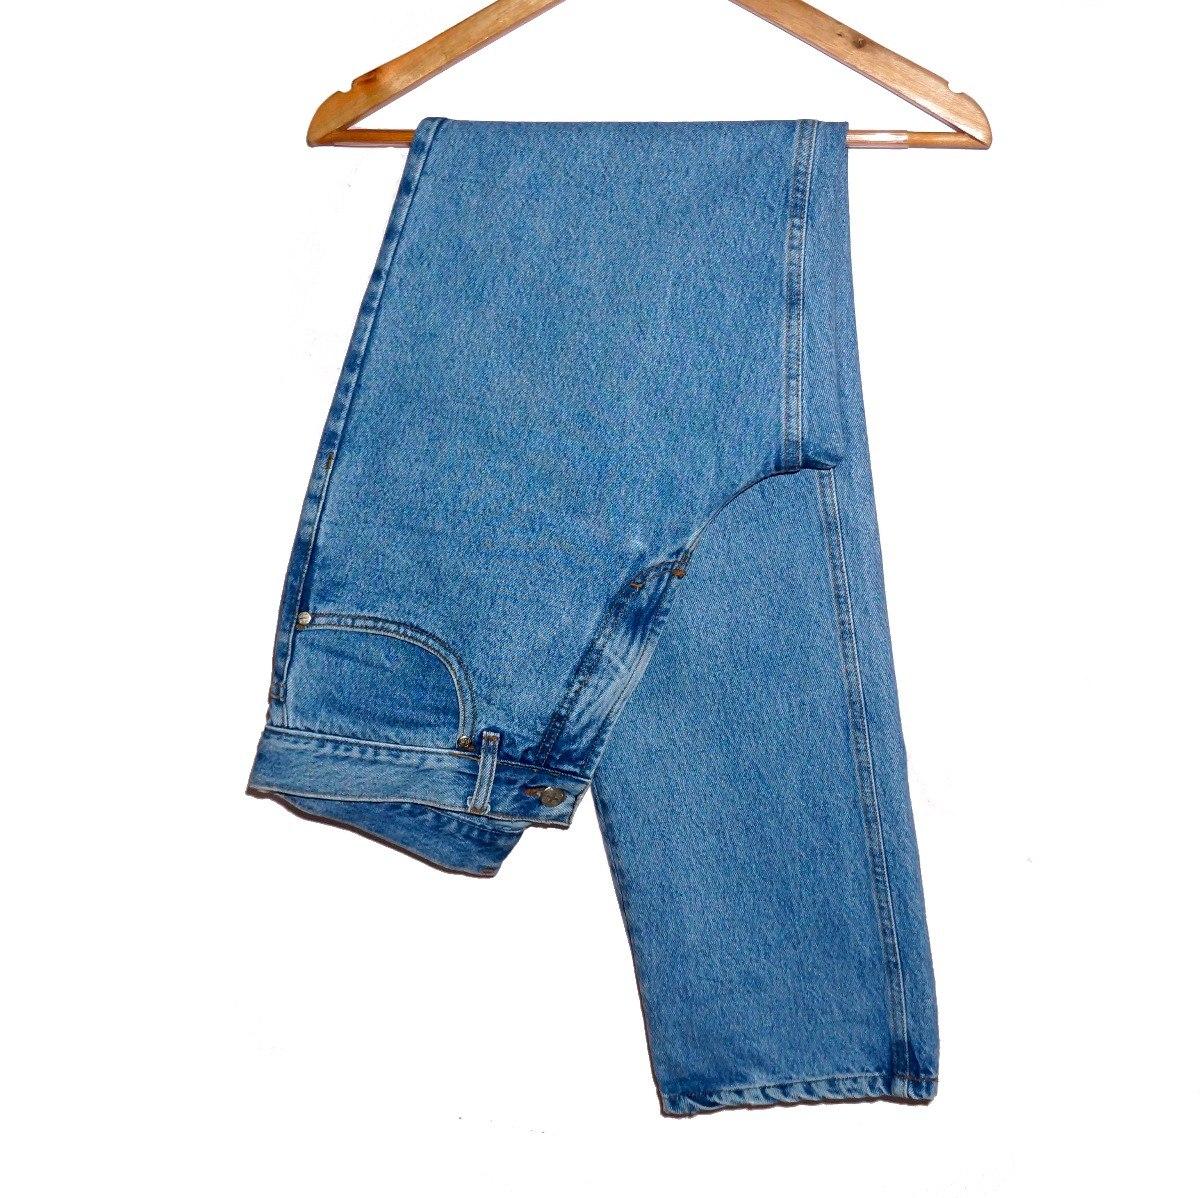 33540cc9f5 Carregando zoom... calça mom jeans vintage blue jeans cintura alta unisex